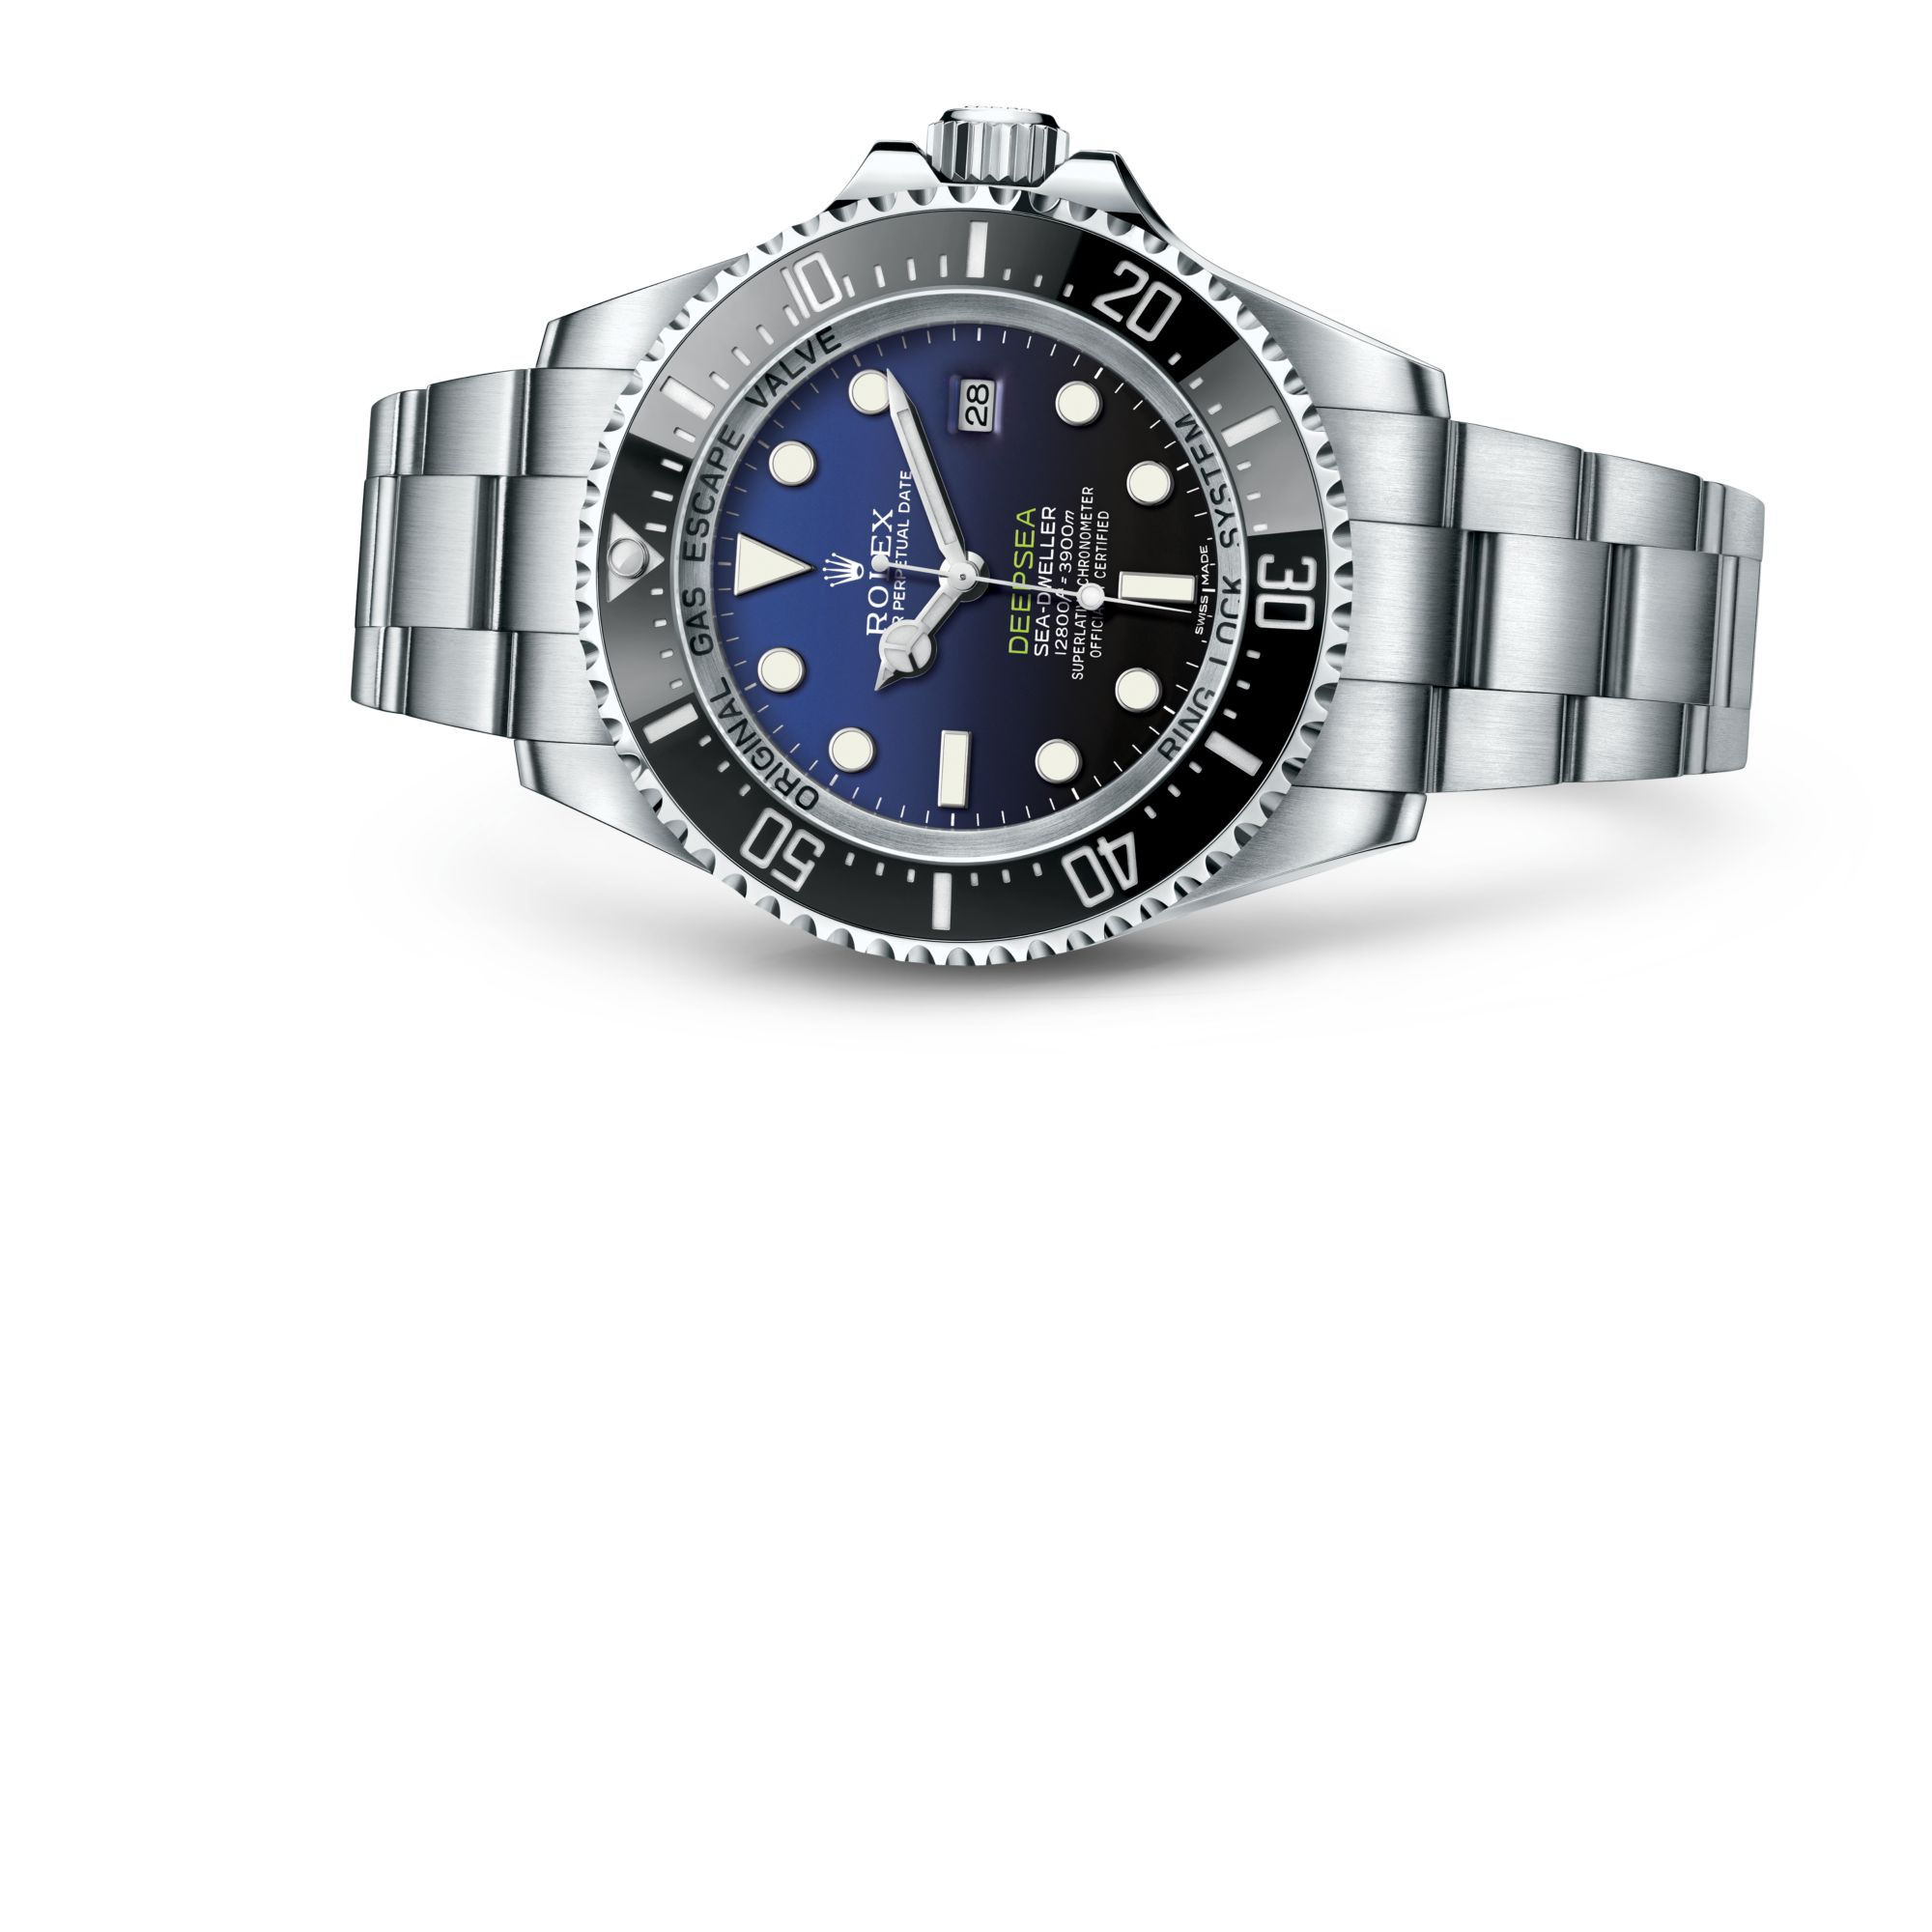 Rolex Rolex Deepsea D-blue dial M116660-0003